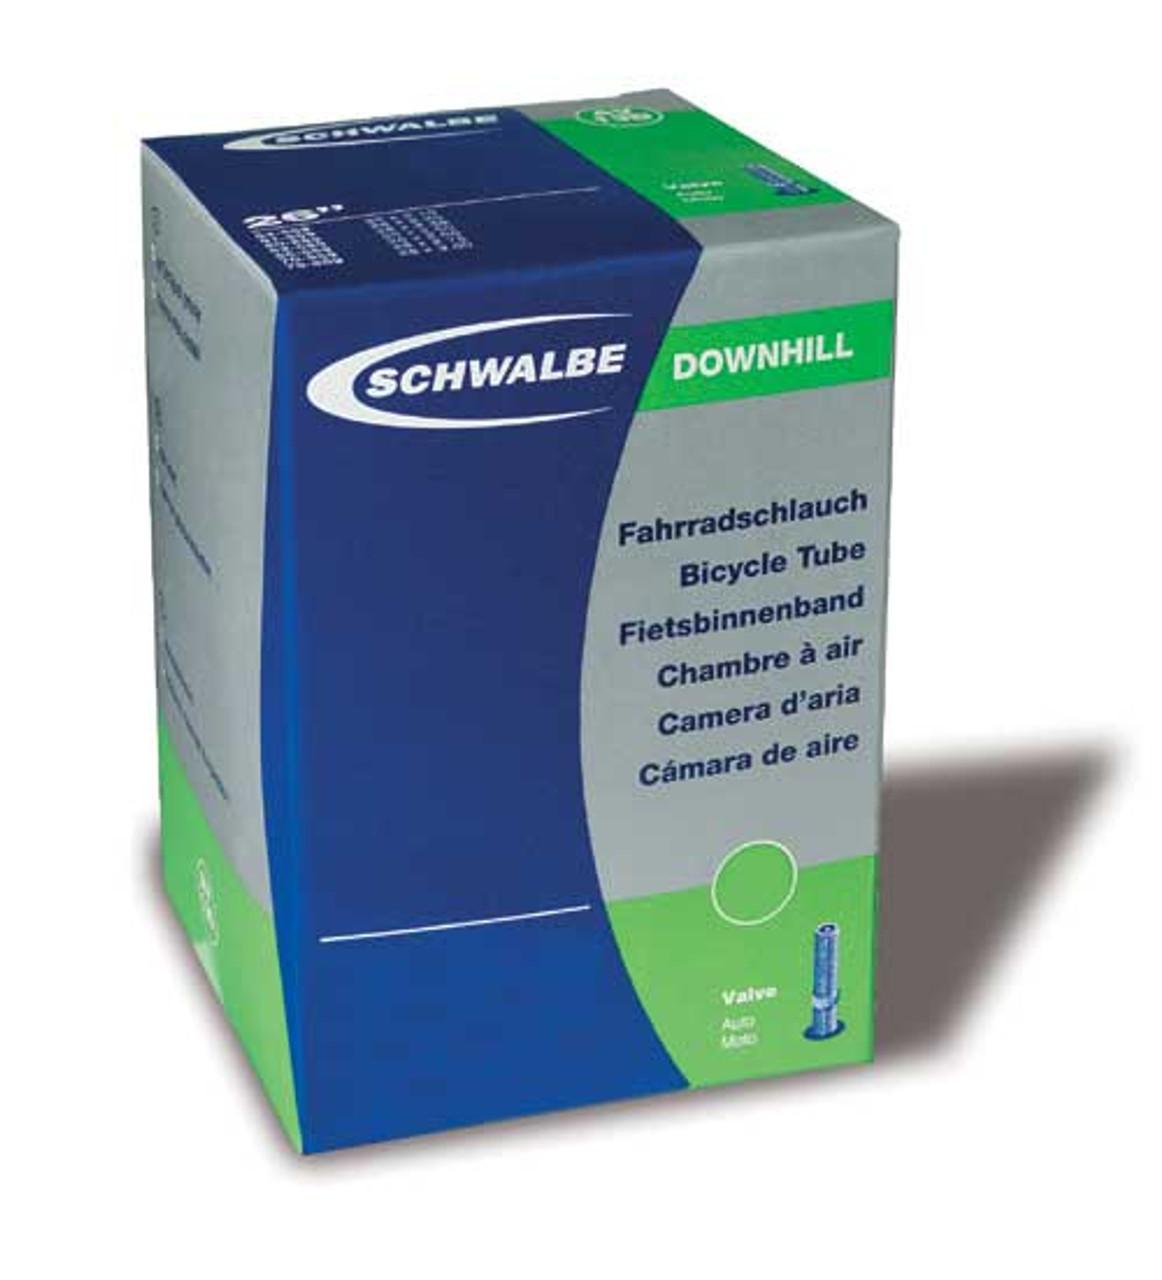 Schwalbe AV10D Downhill Inner Tube - 24 x 2.10/3.00 - 40mm Schrader Valve